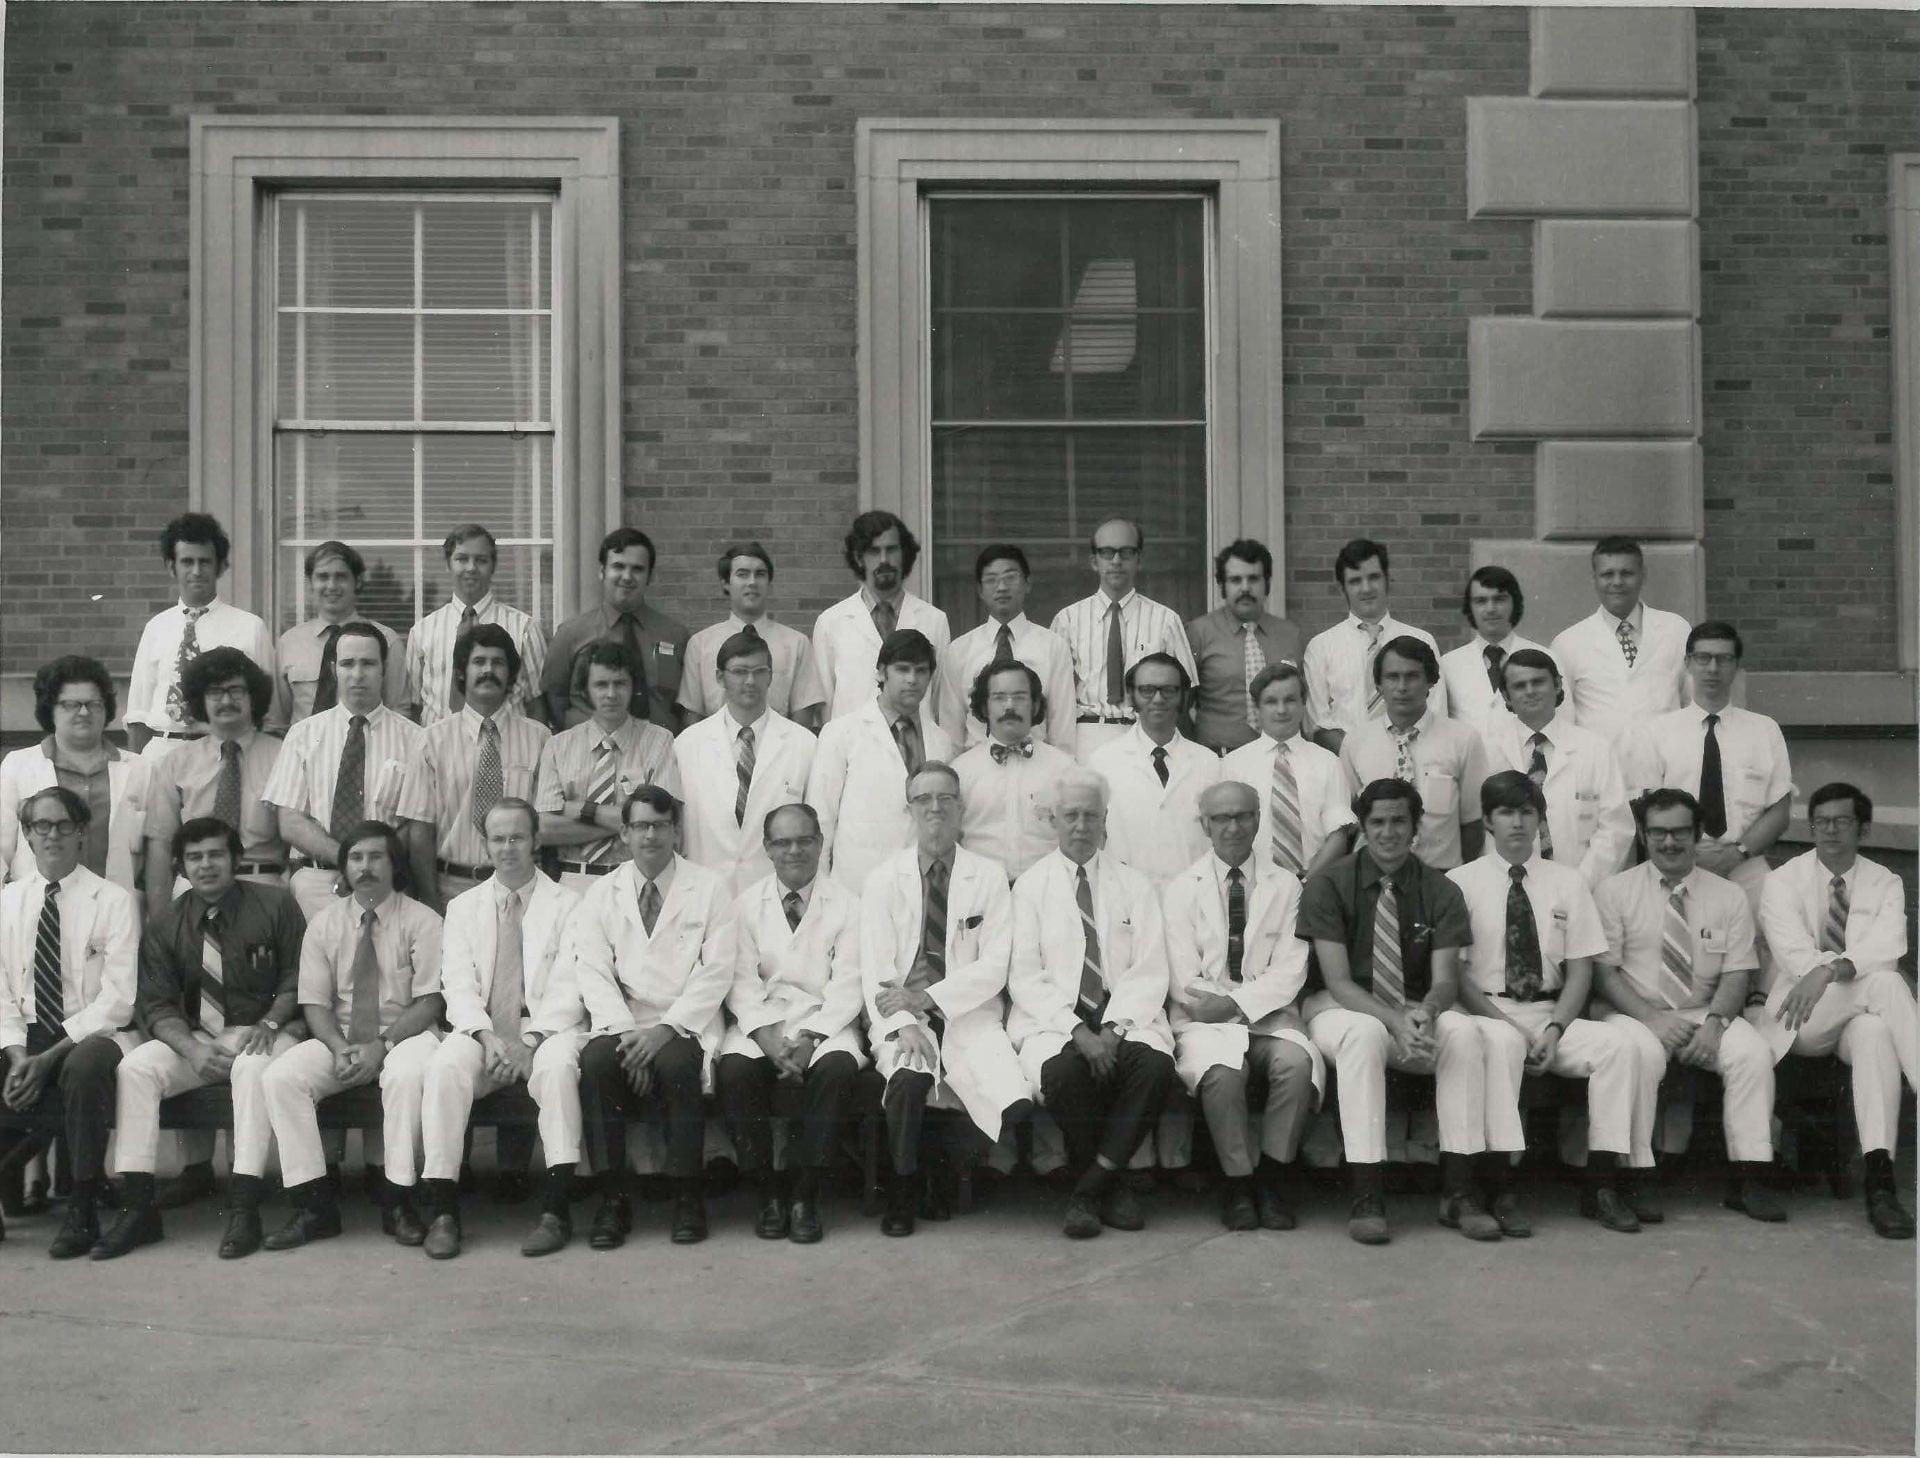 1970 Housestaff Photo (2)